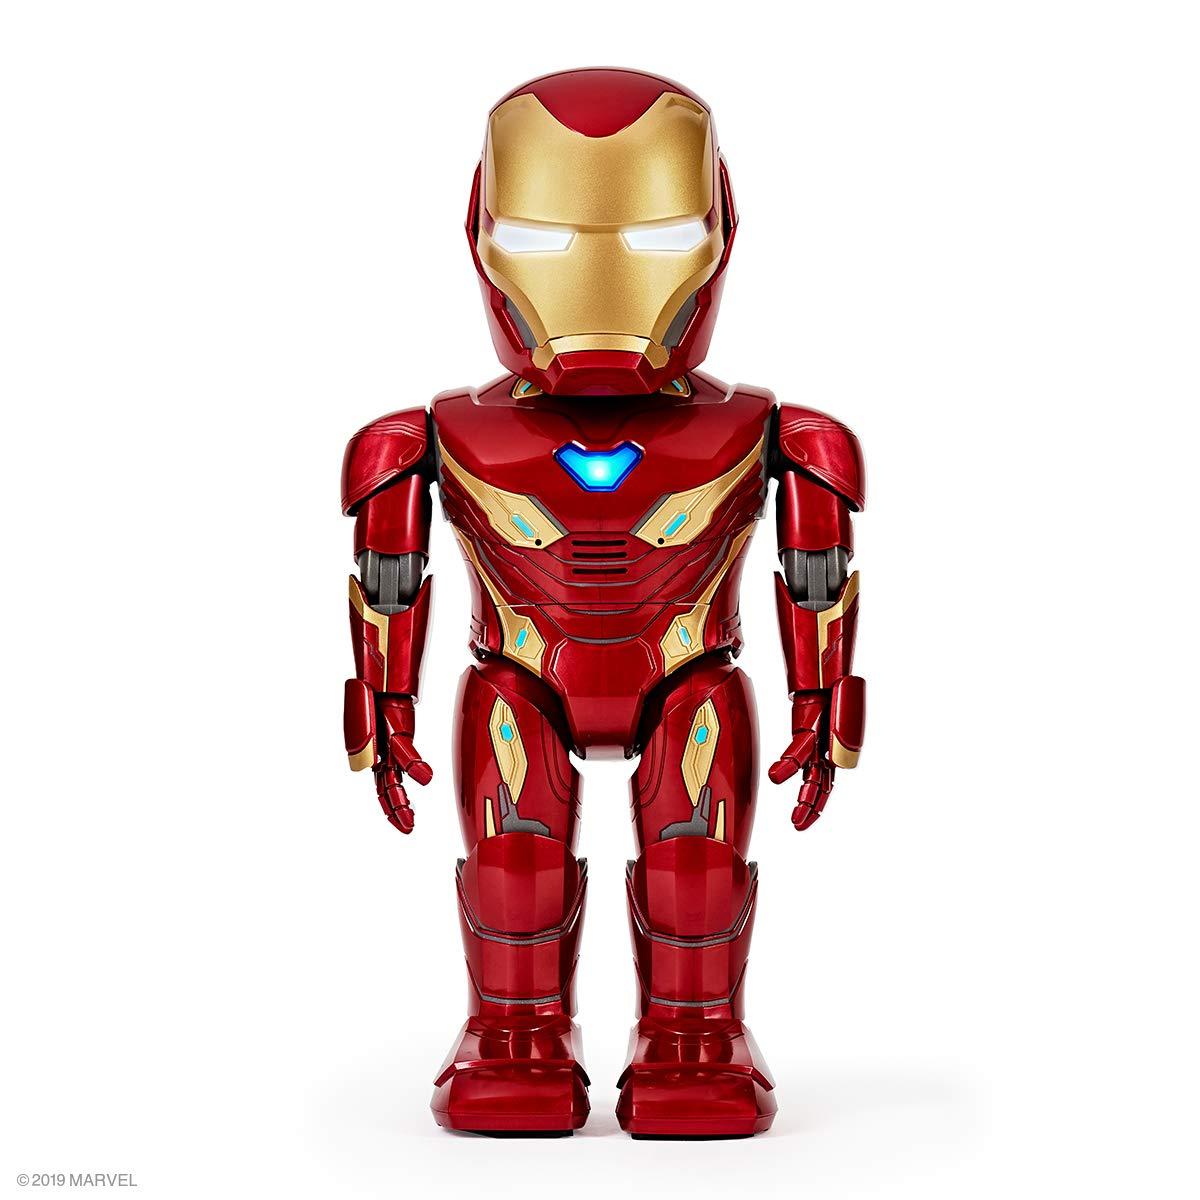 UBTECH Marvel Avengers: Endgame Iron Man Mk50 Robot by UBTECH (Image #1)